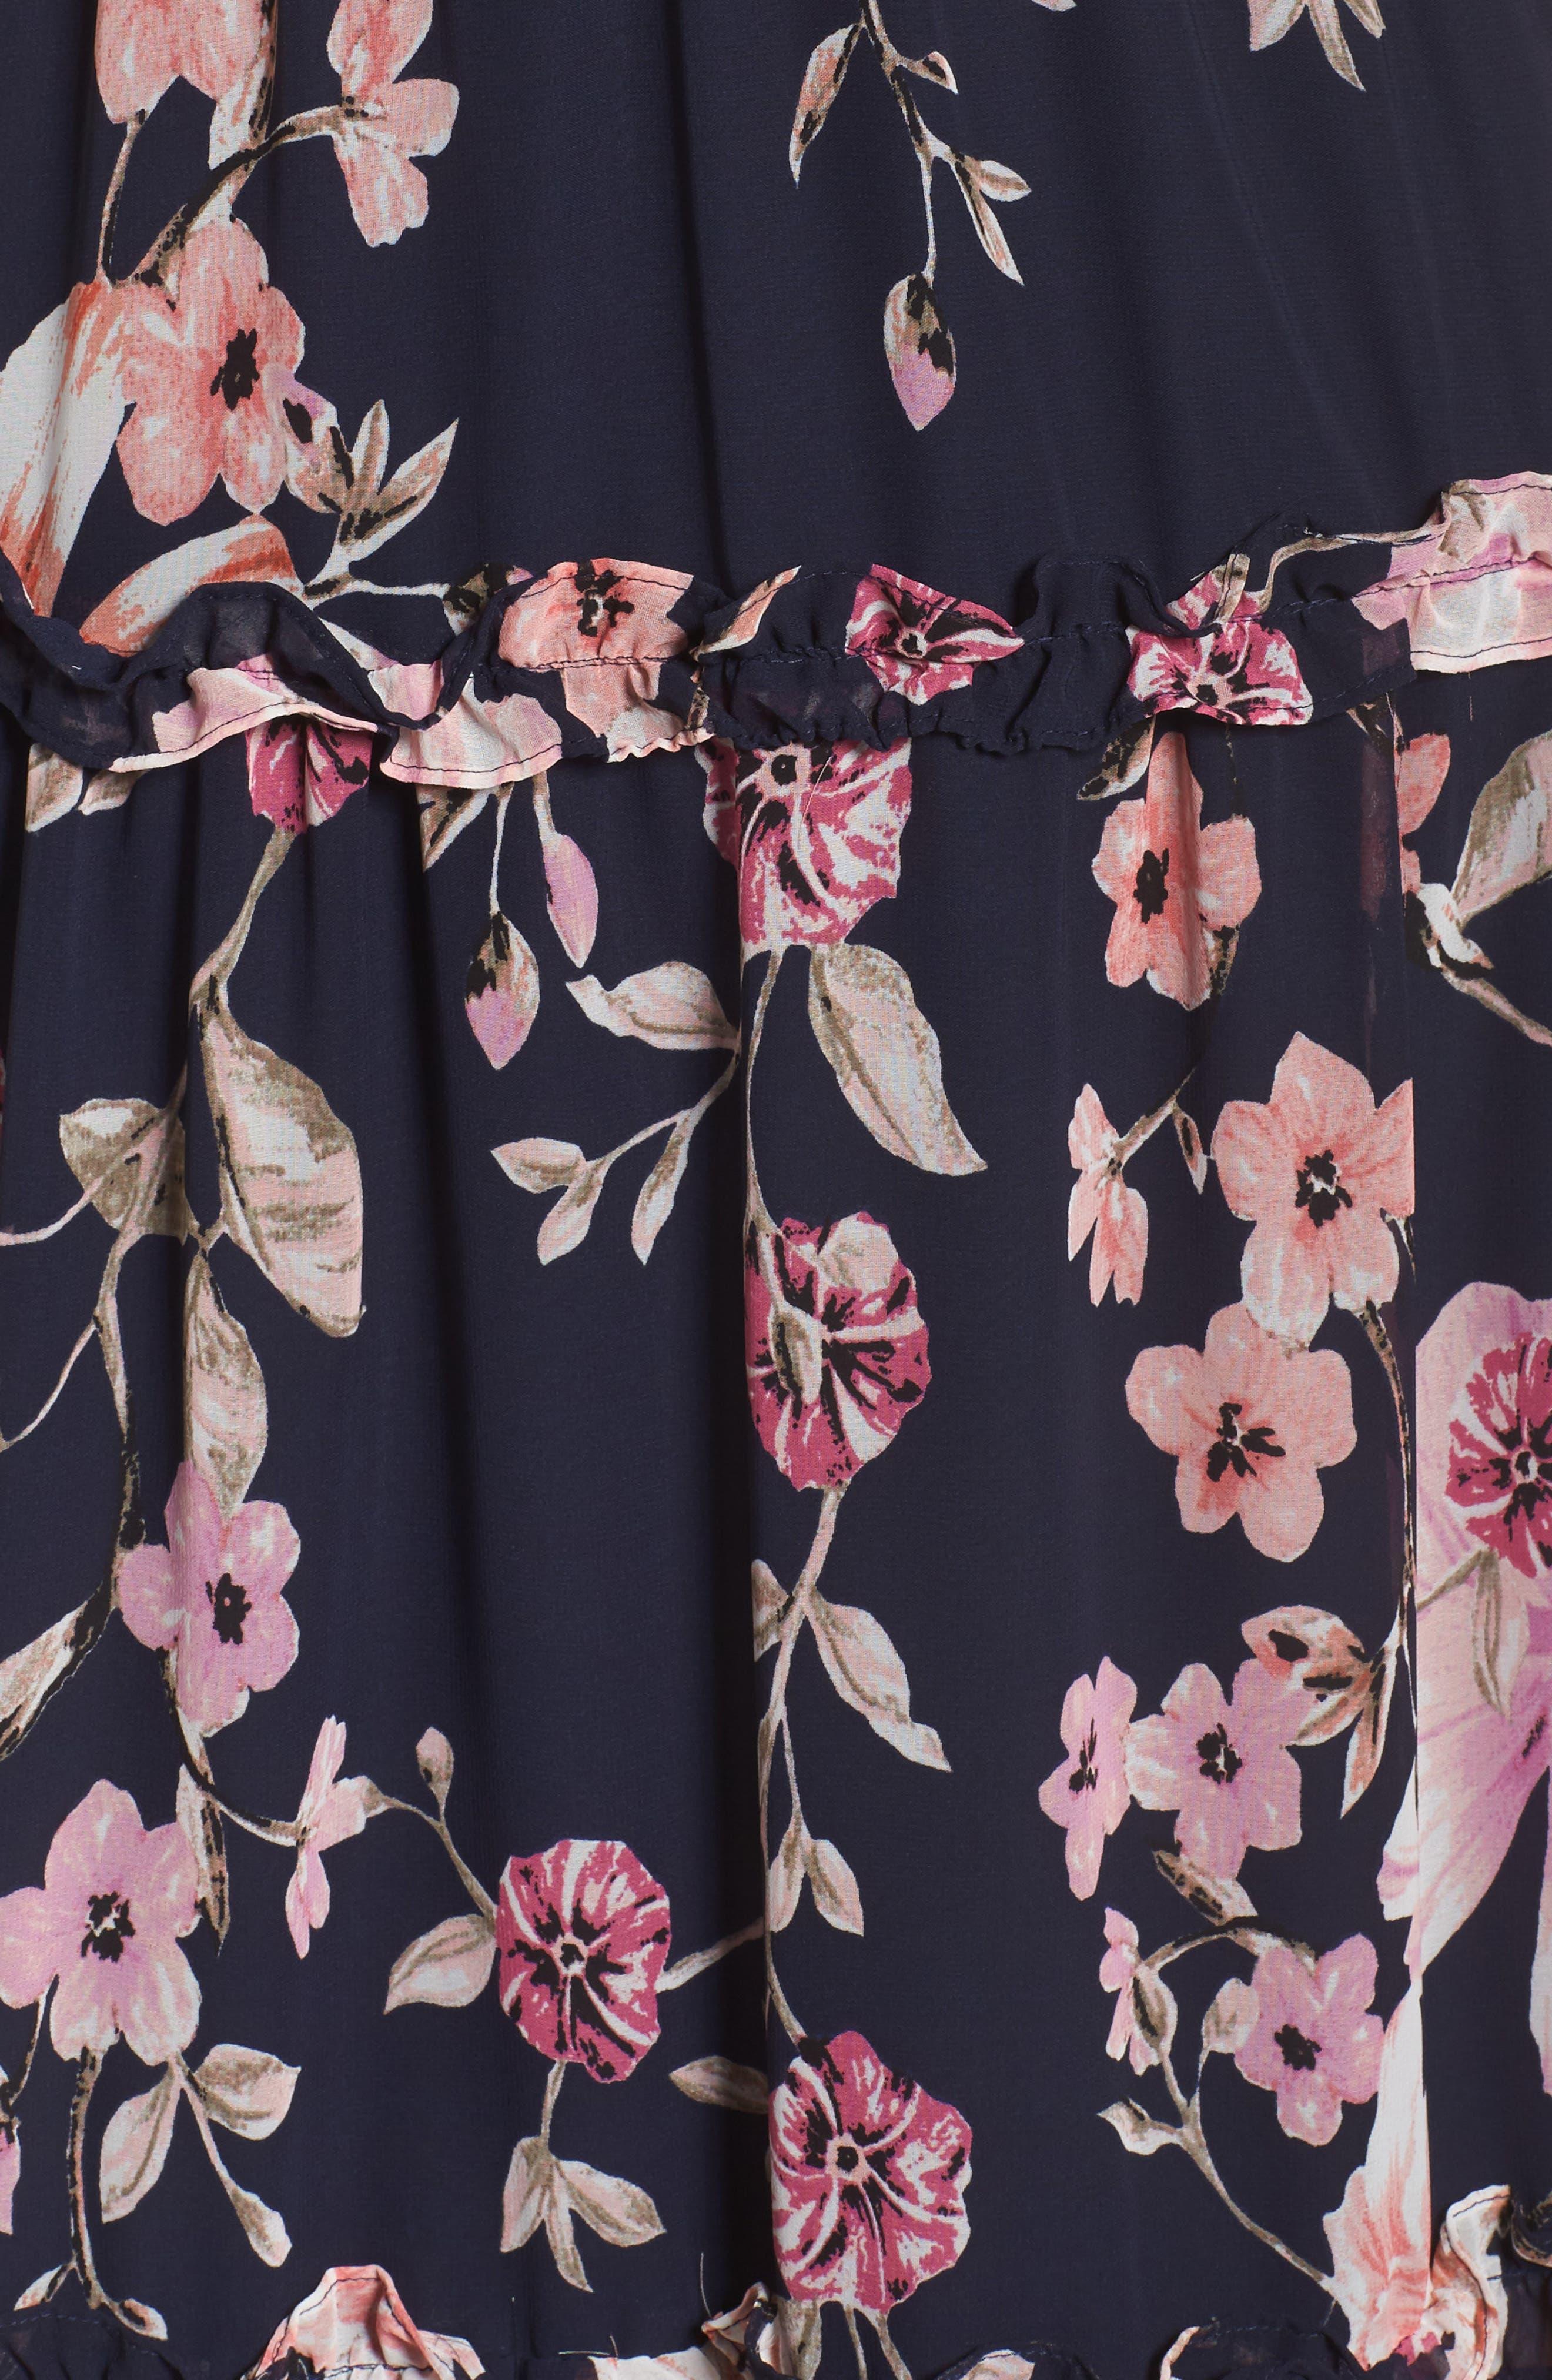 Floral Halter Maxi Dress,                             Alternate thumbnail 5, color,                             654